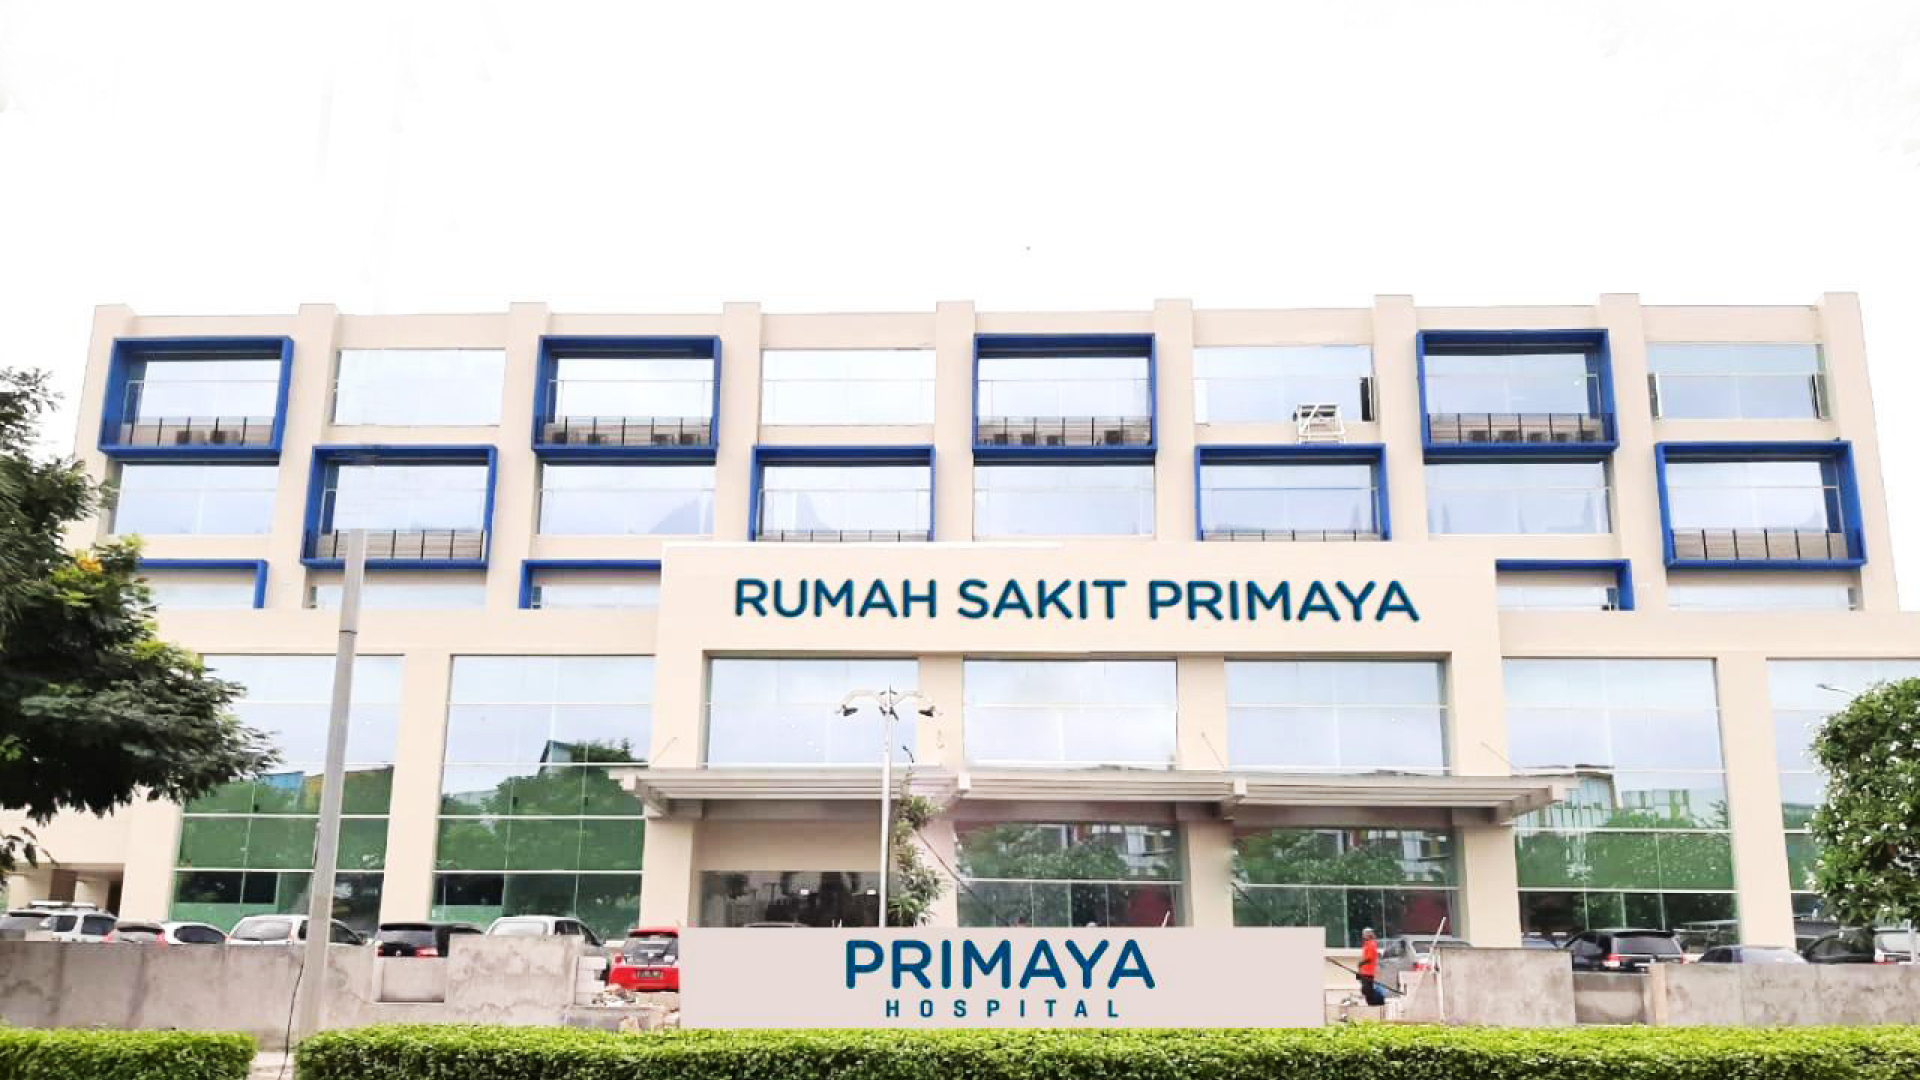 Primaya Hospital Karawang